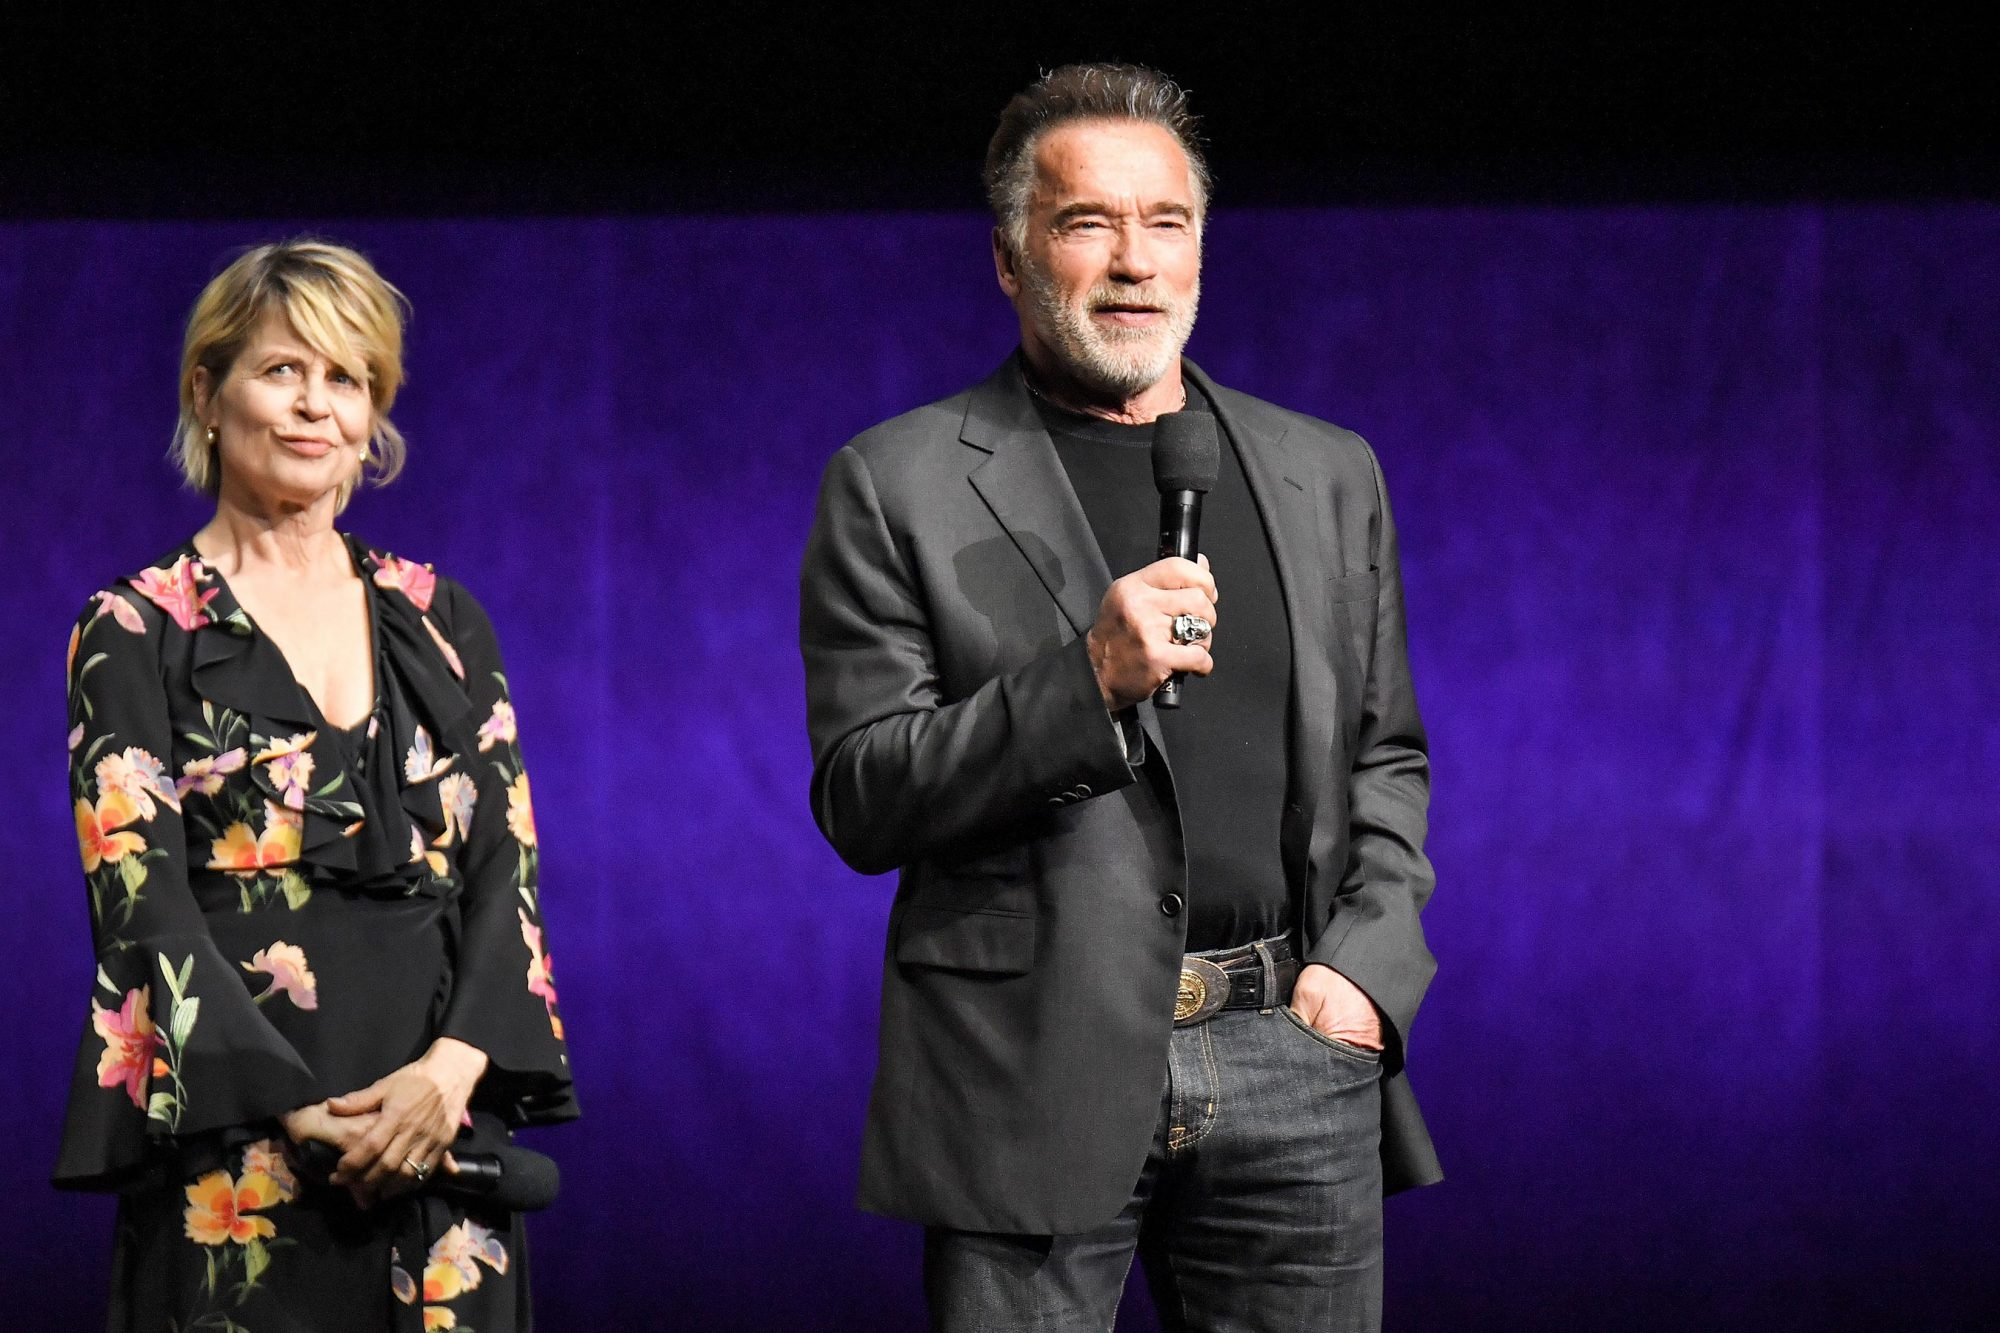 Paramount Pictures Presentation, CinemaCon, Las Vegas, USA - 4 Apr 2019